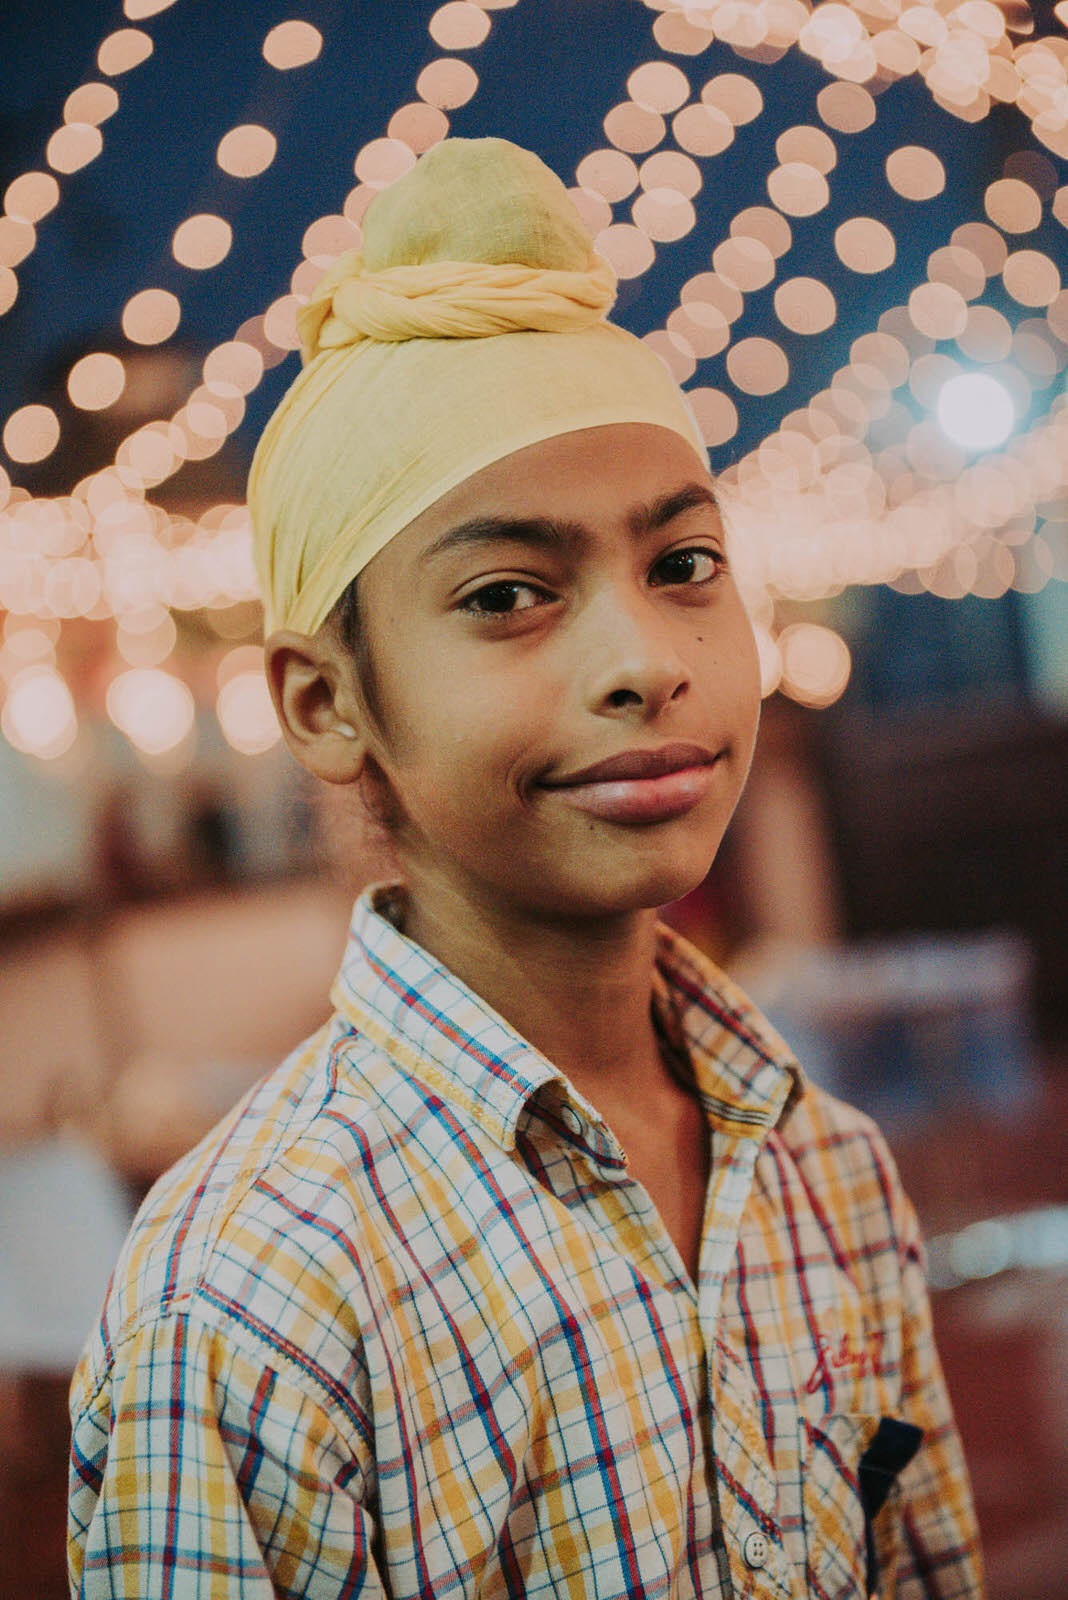 Sikh Boy Portrait Punjab India.jpg